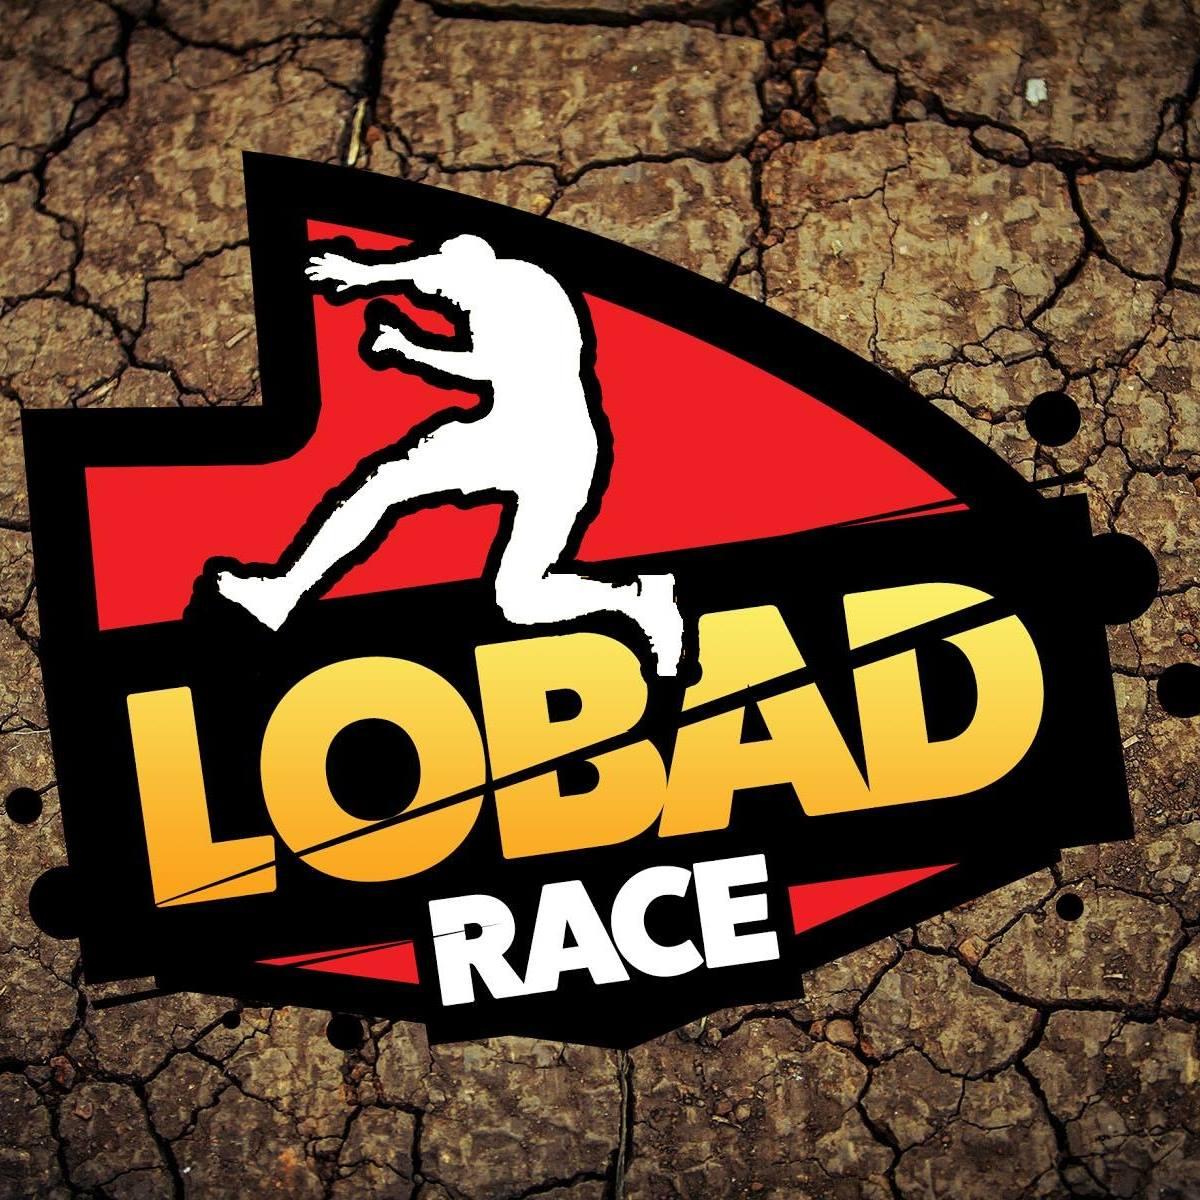 LOBAD RACE